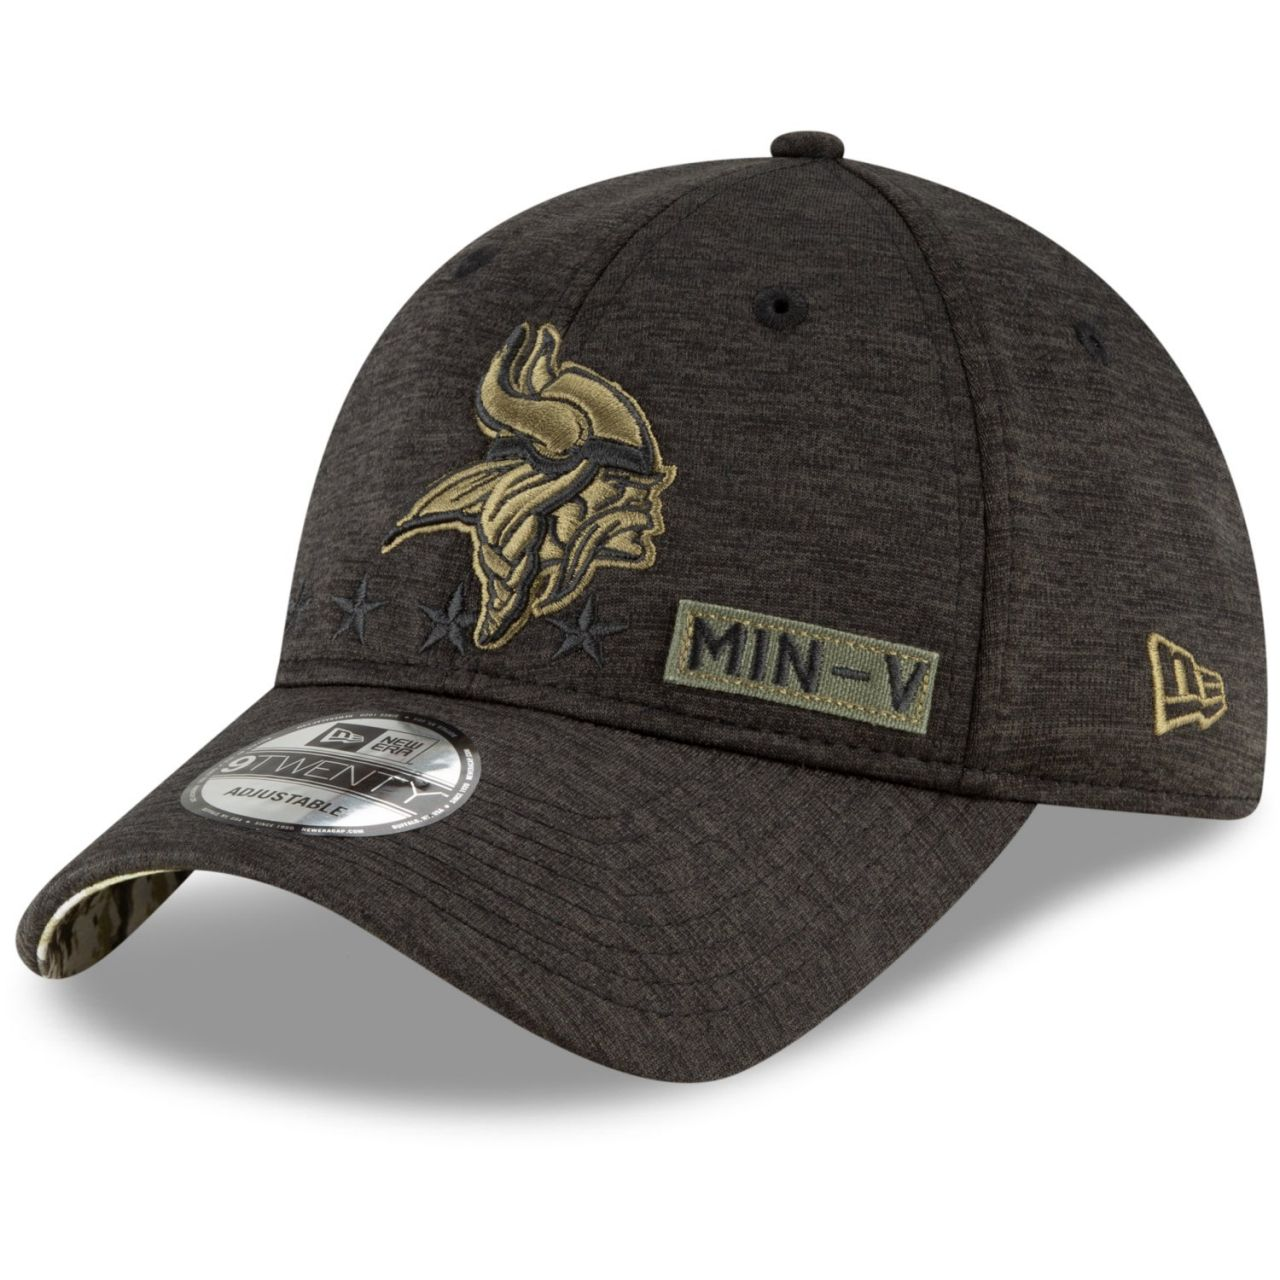 amfoo - New Era 9TWENTY Cap Salute to Service Minnesota Vikings